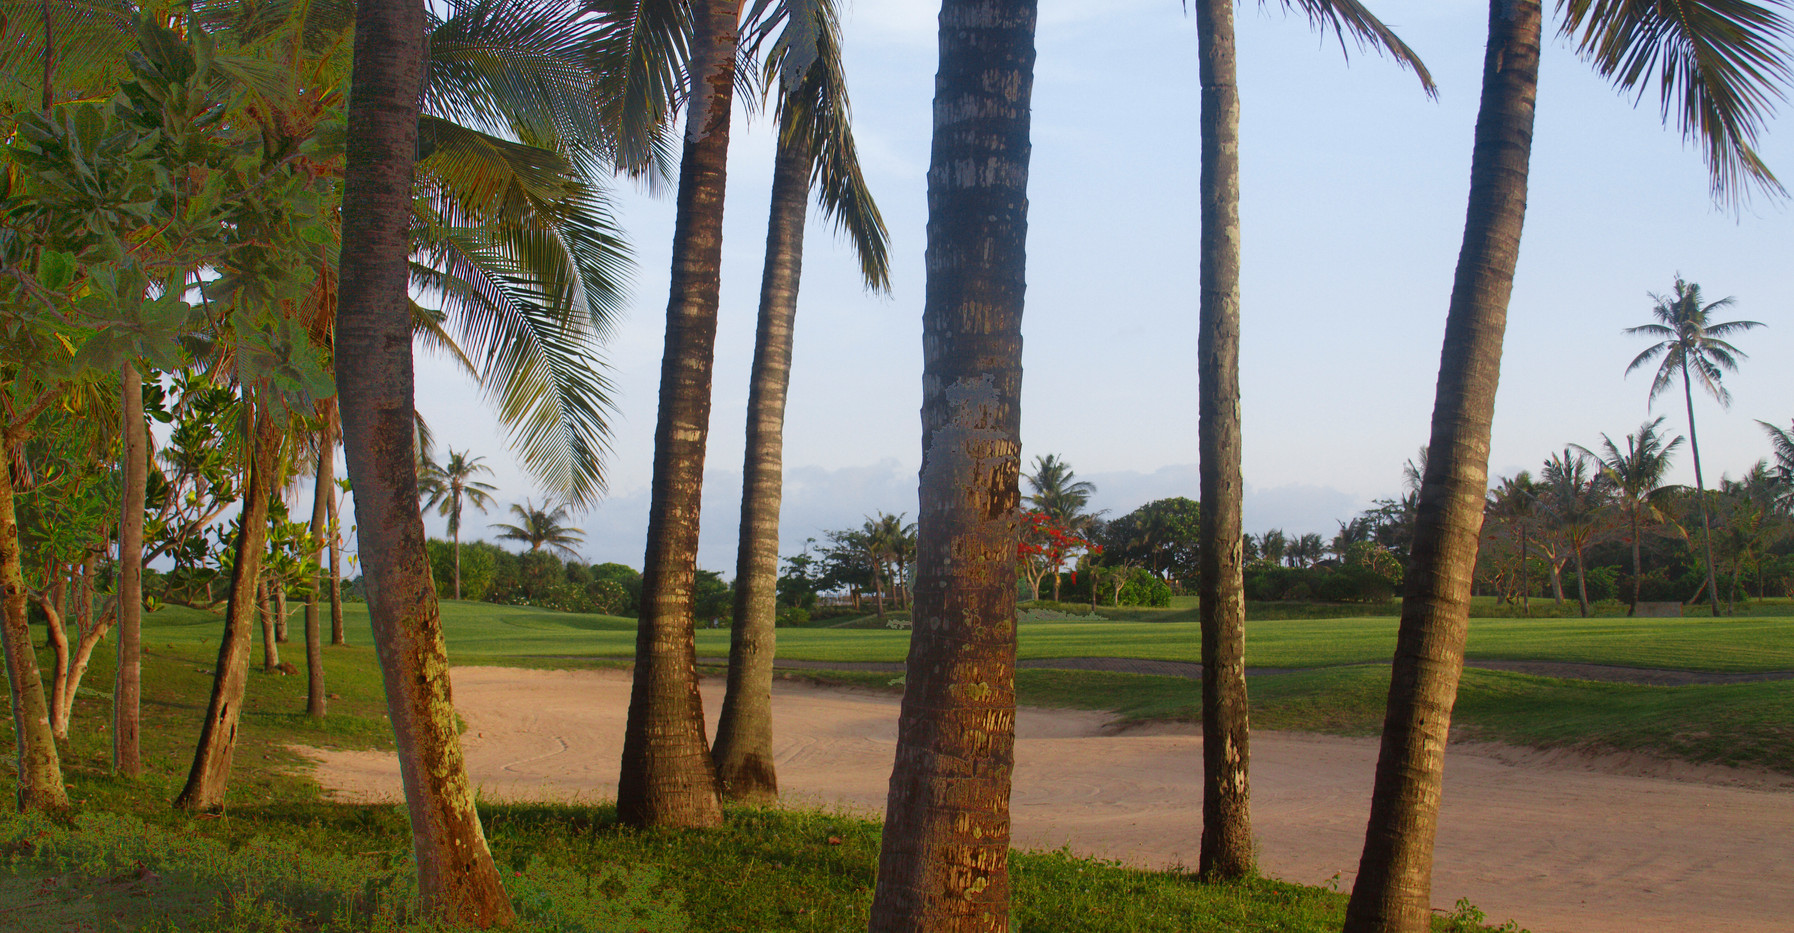 Golf, Anyone??